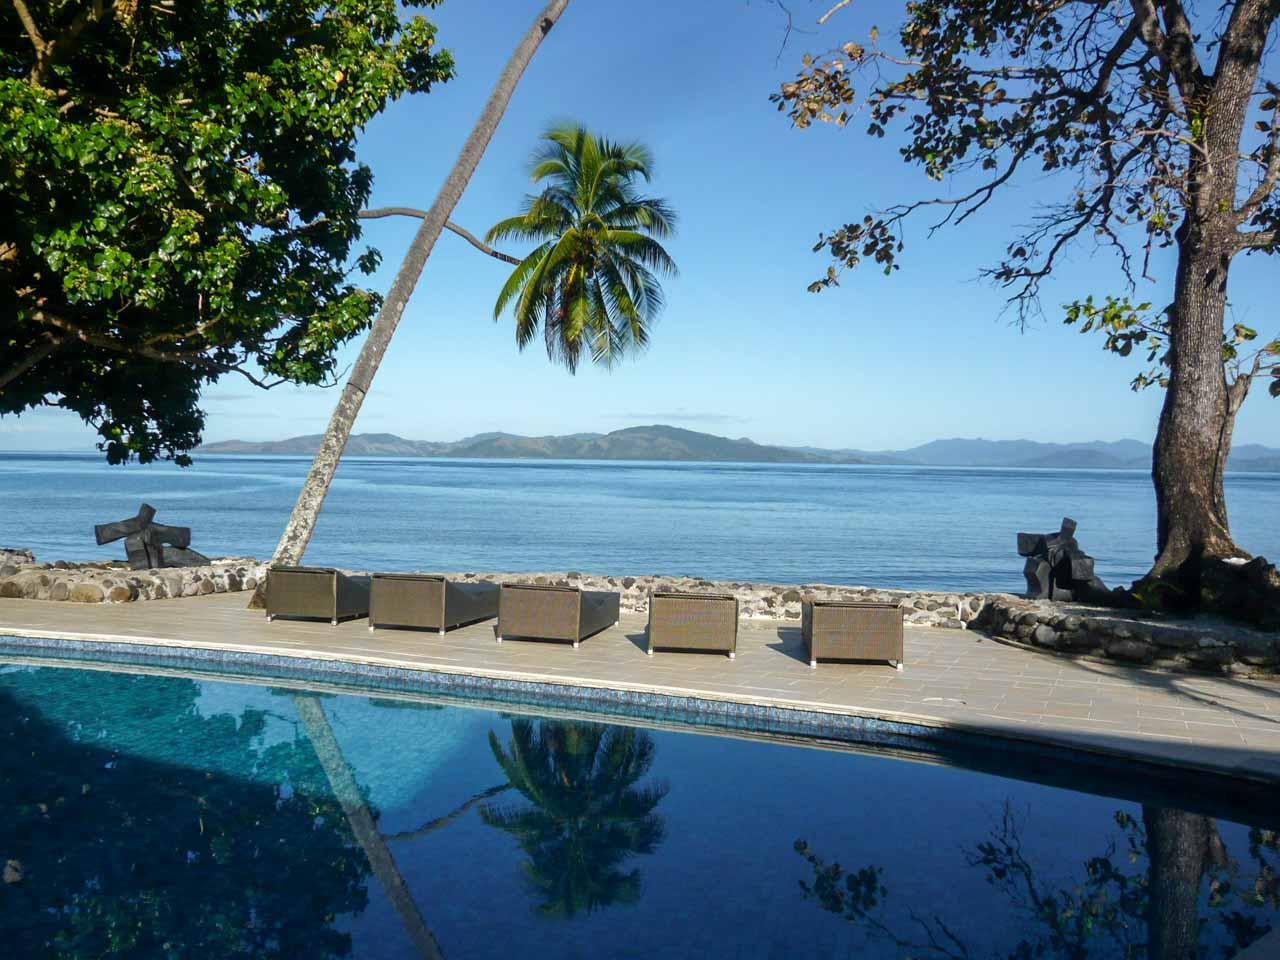 Garden Island Resort - World Class Diving and Vacation